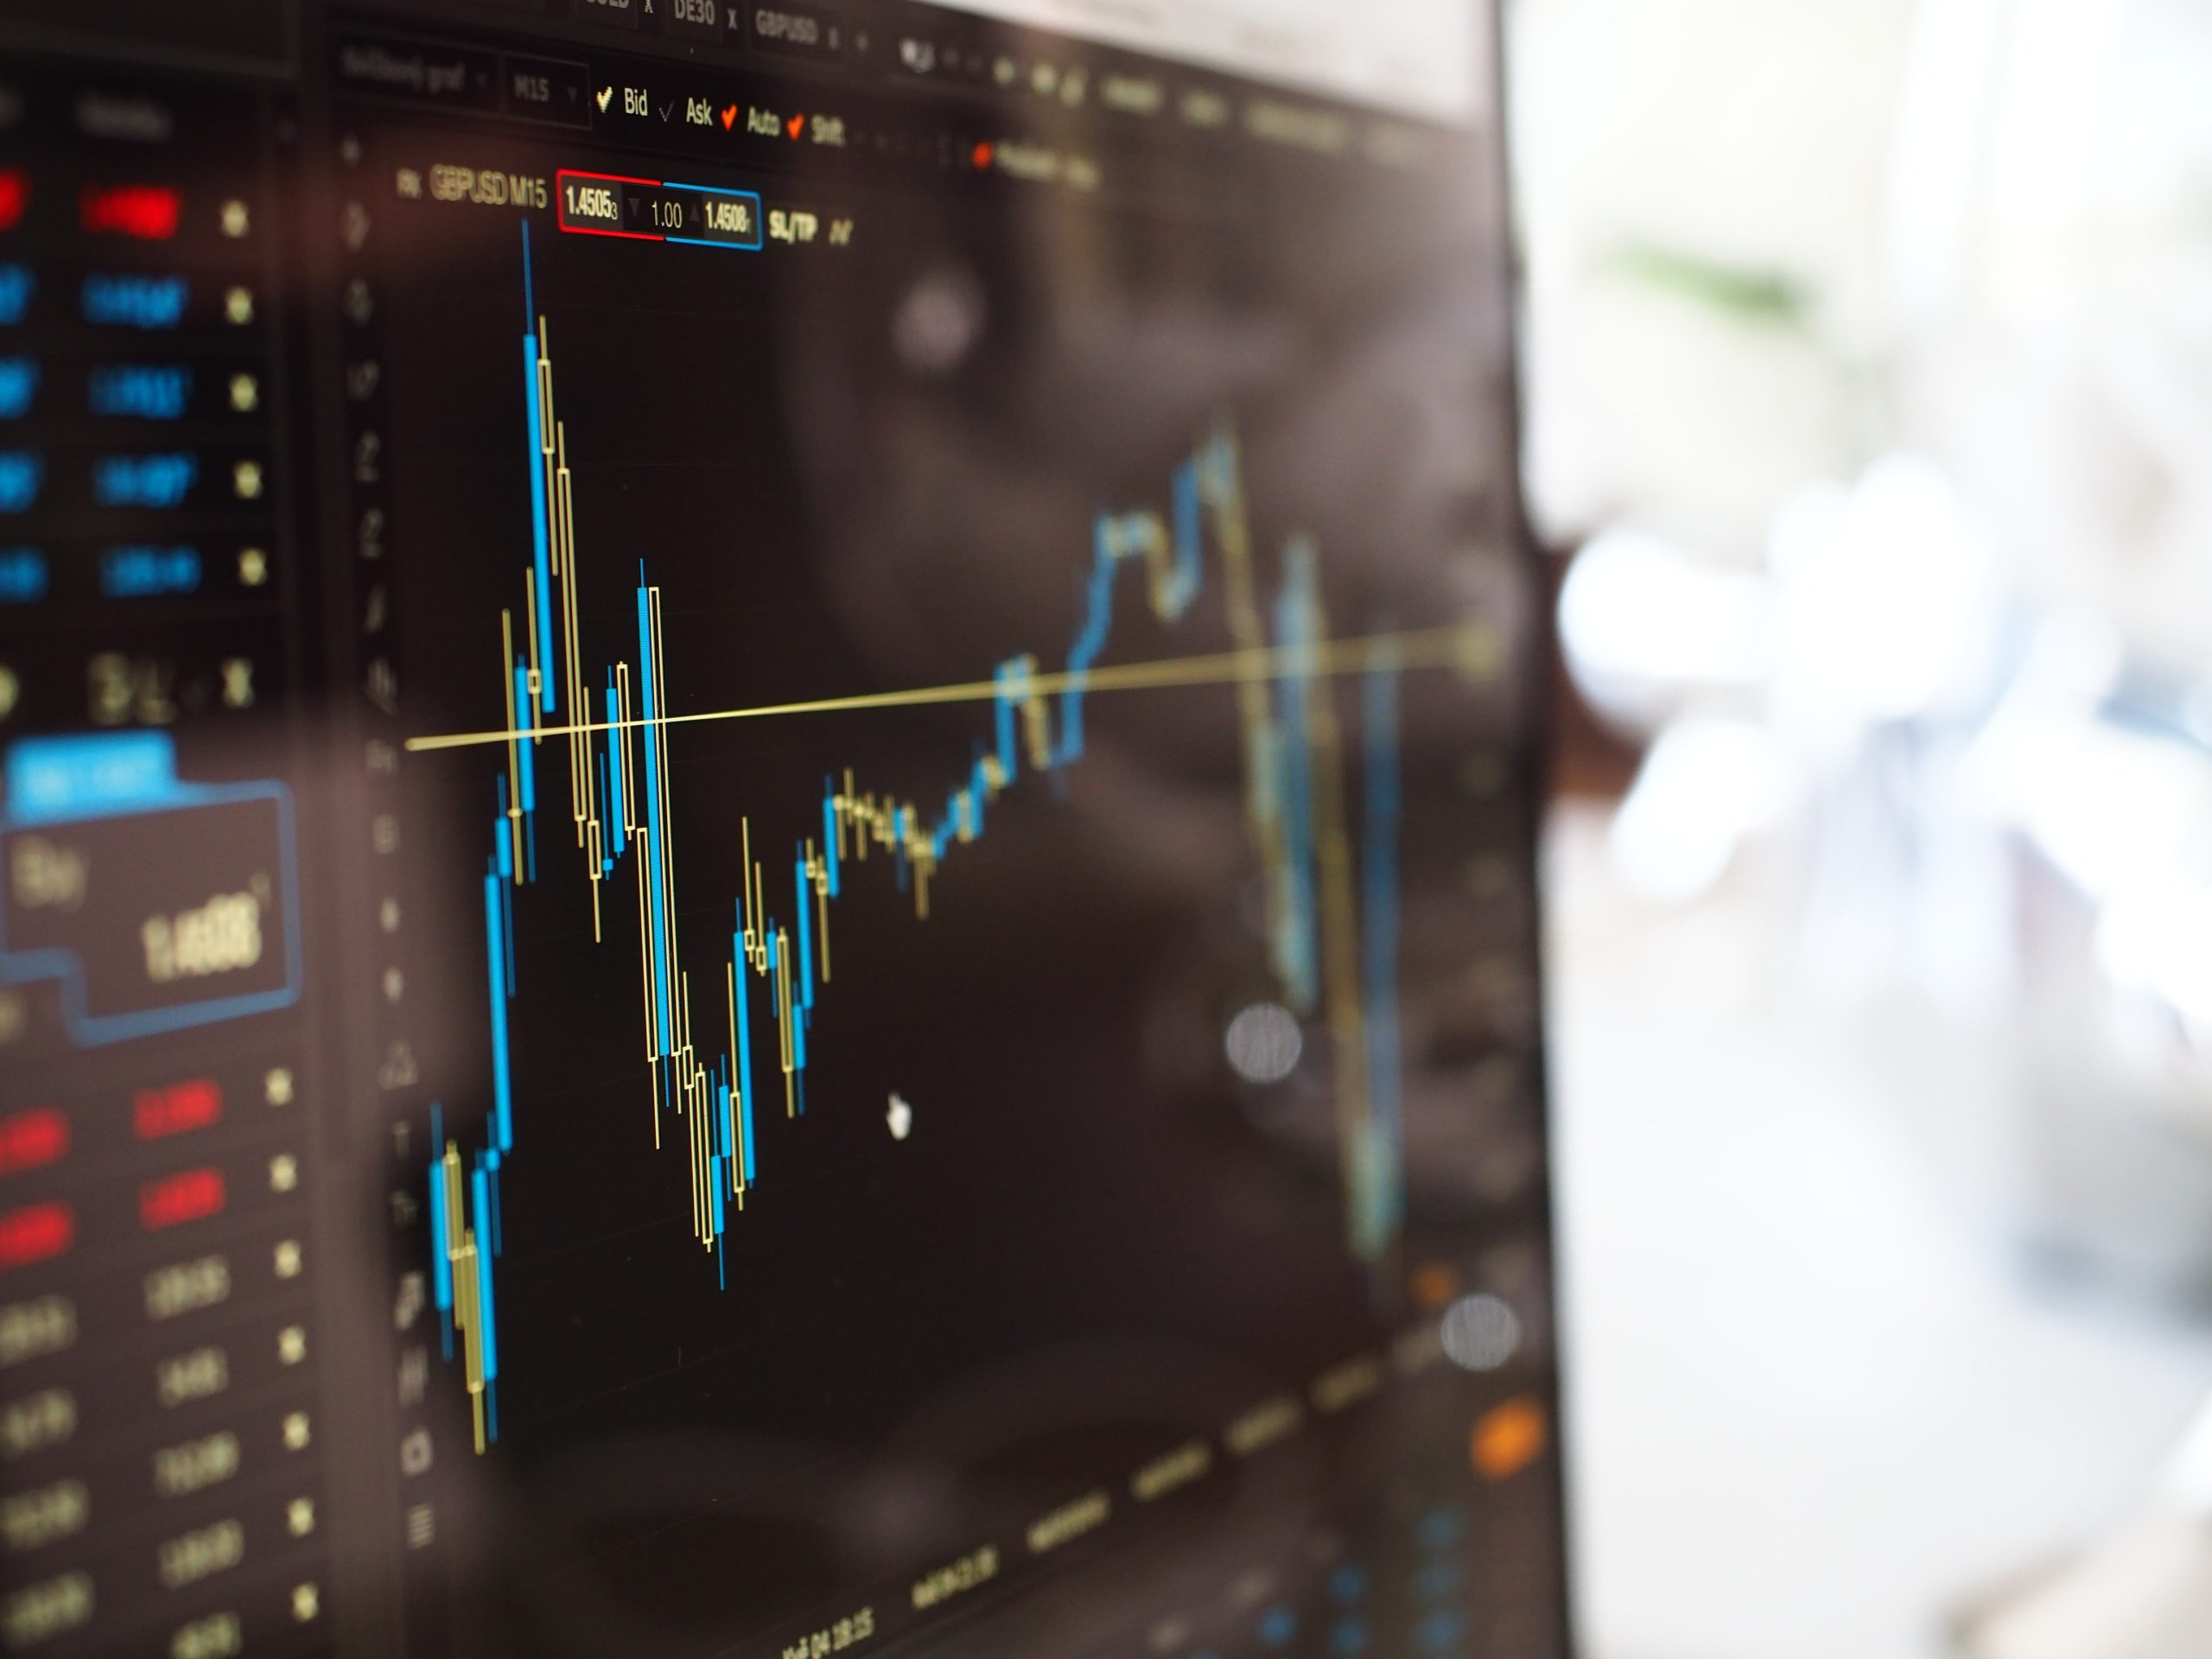 Computer screen showing stock market trends